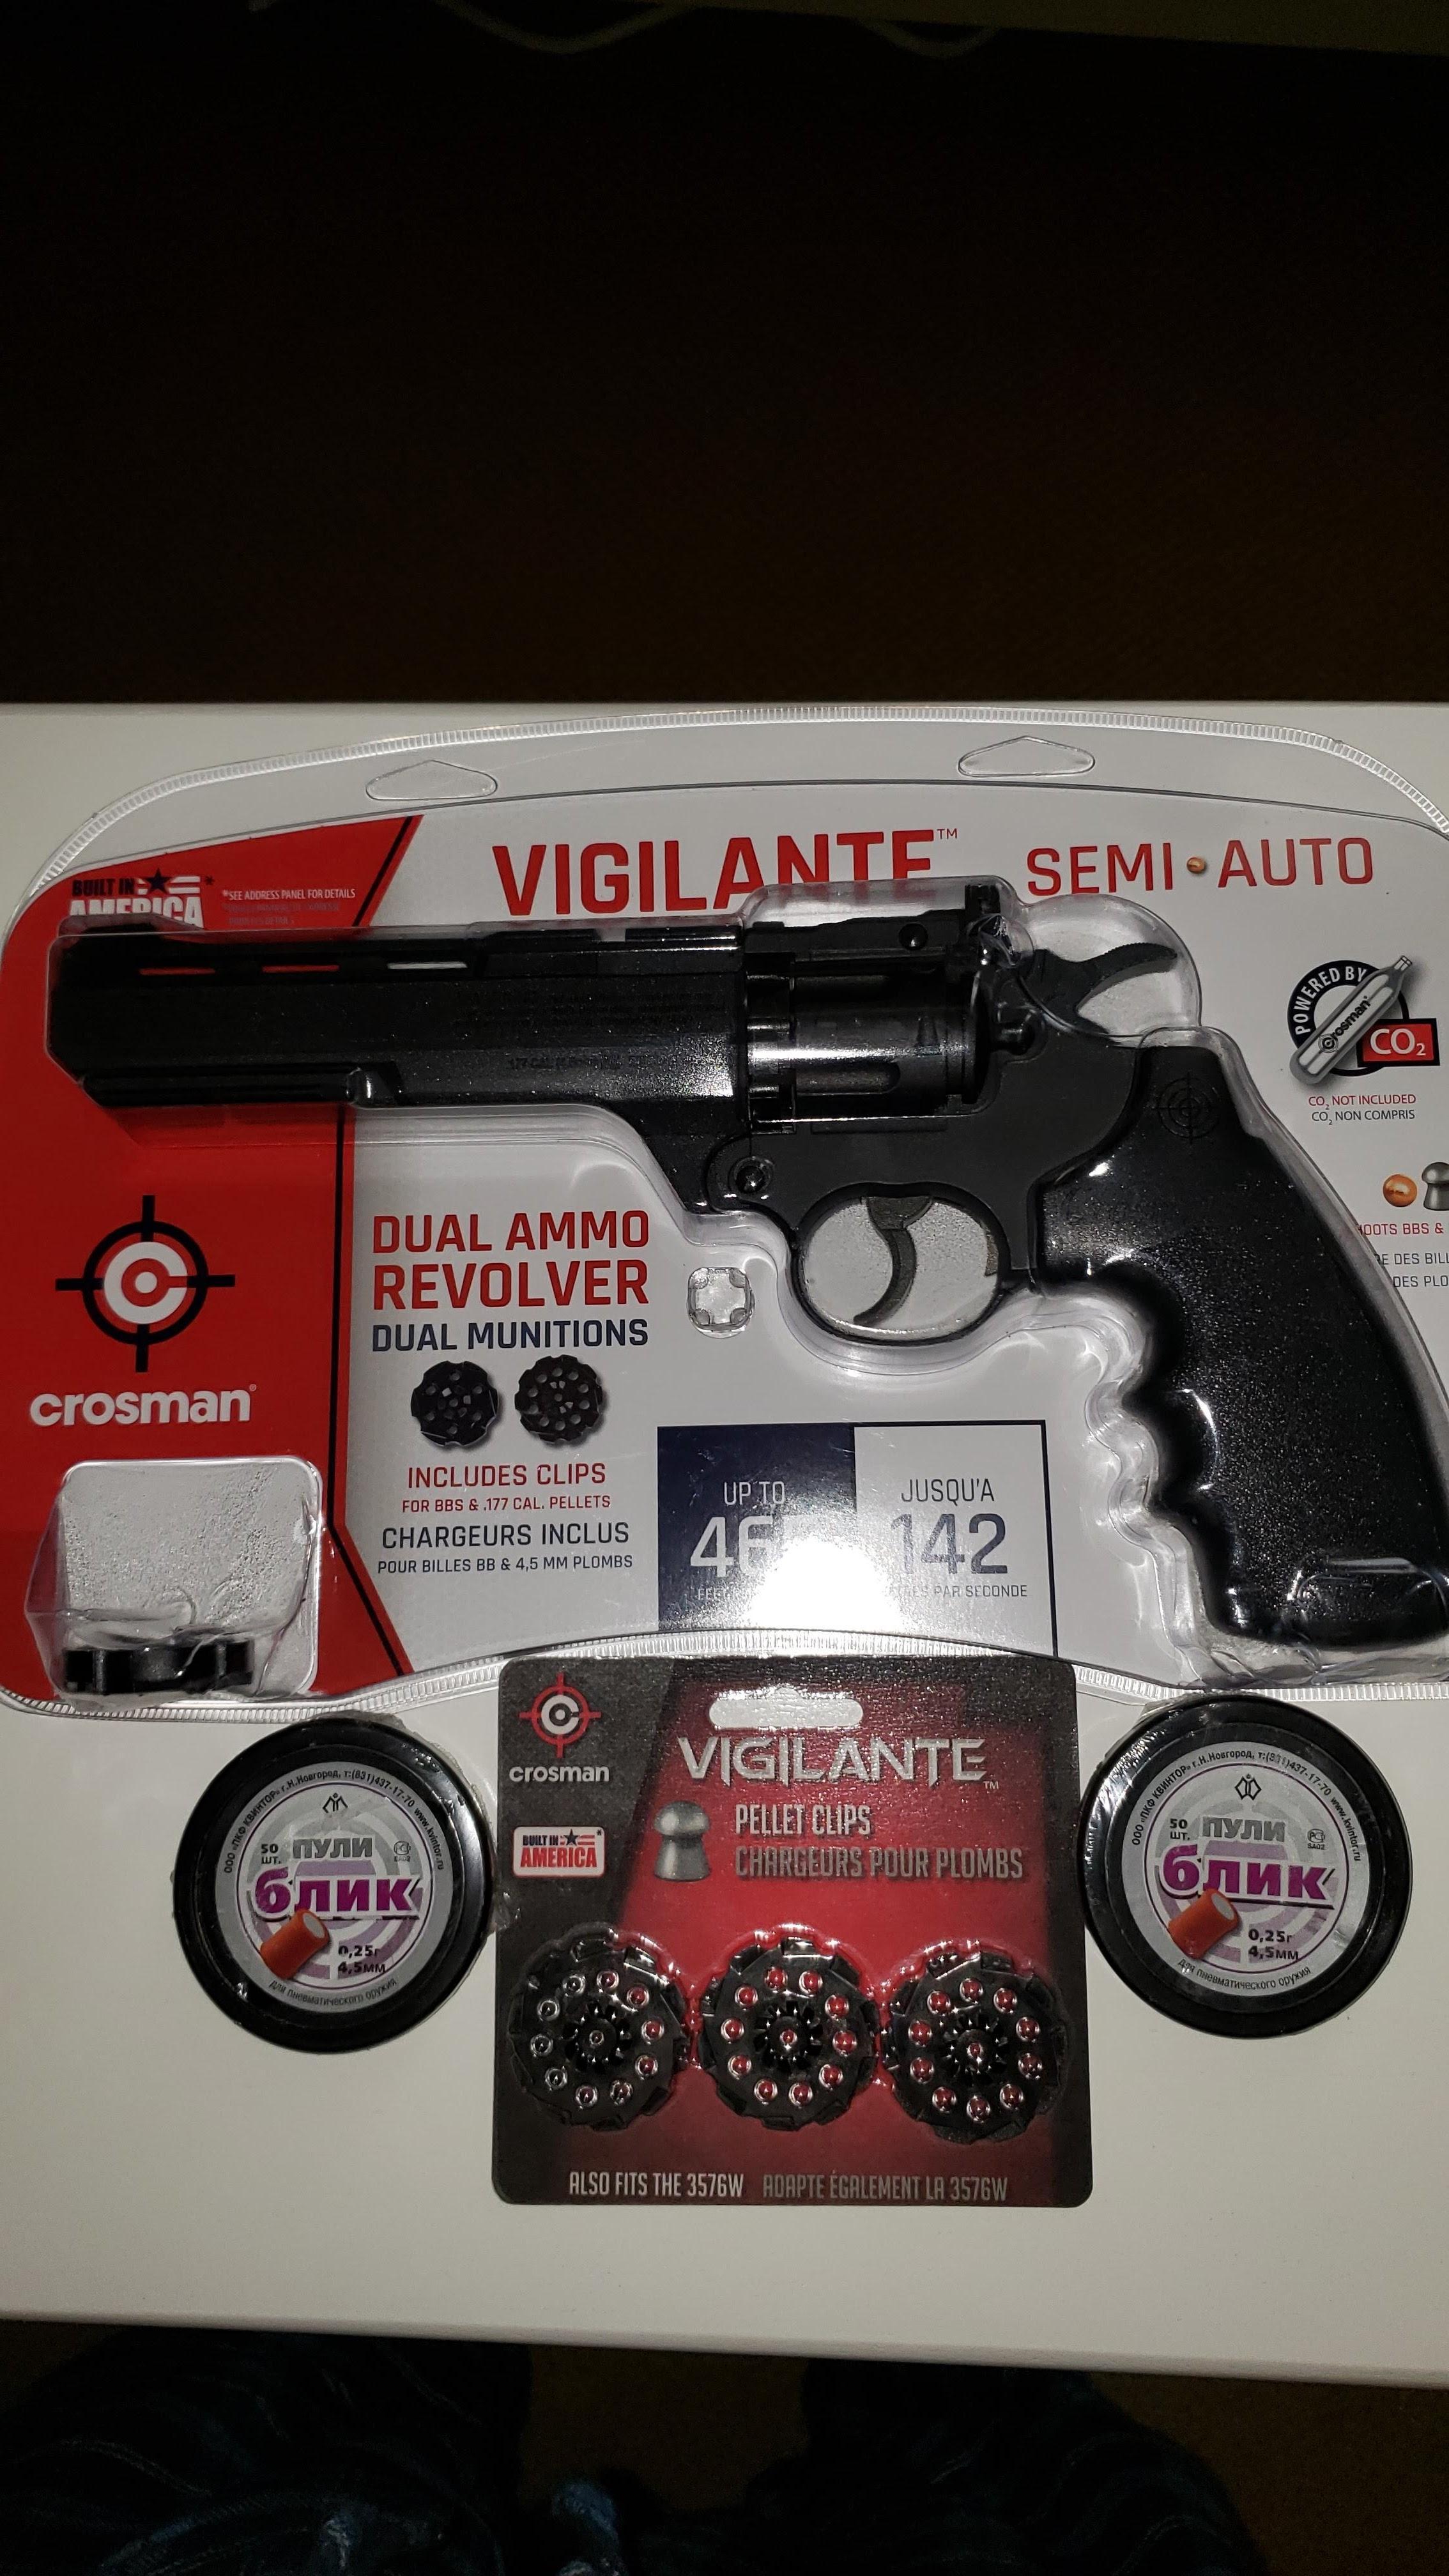 Customer images for Crosman Vigilante | Pyramyd Air